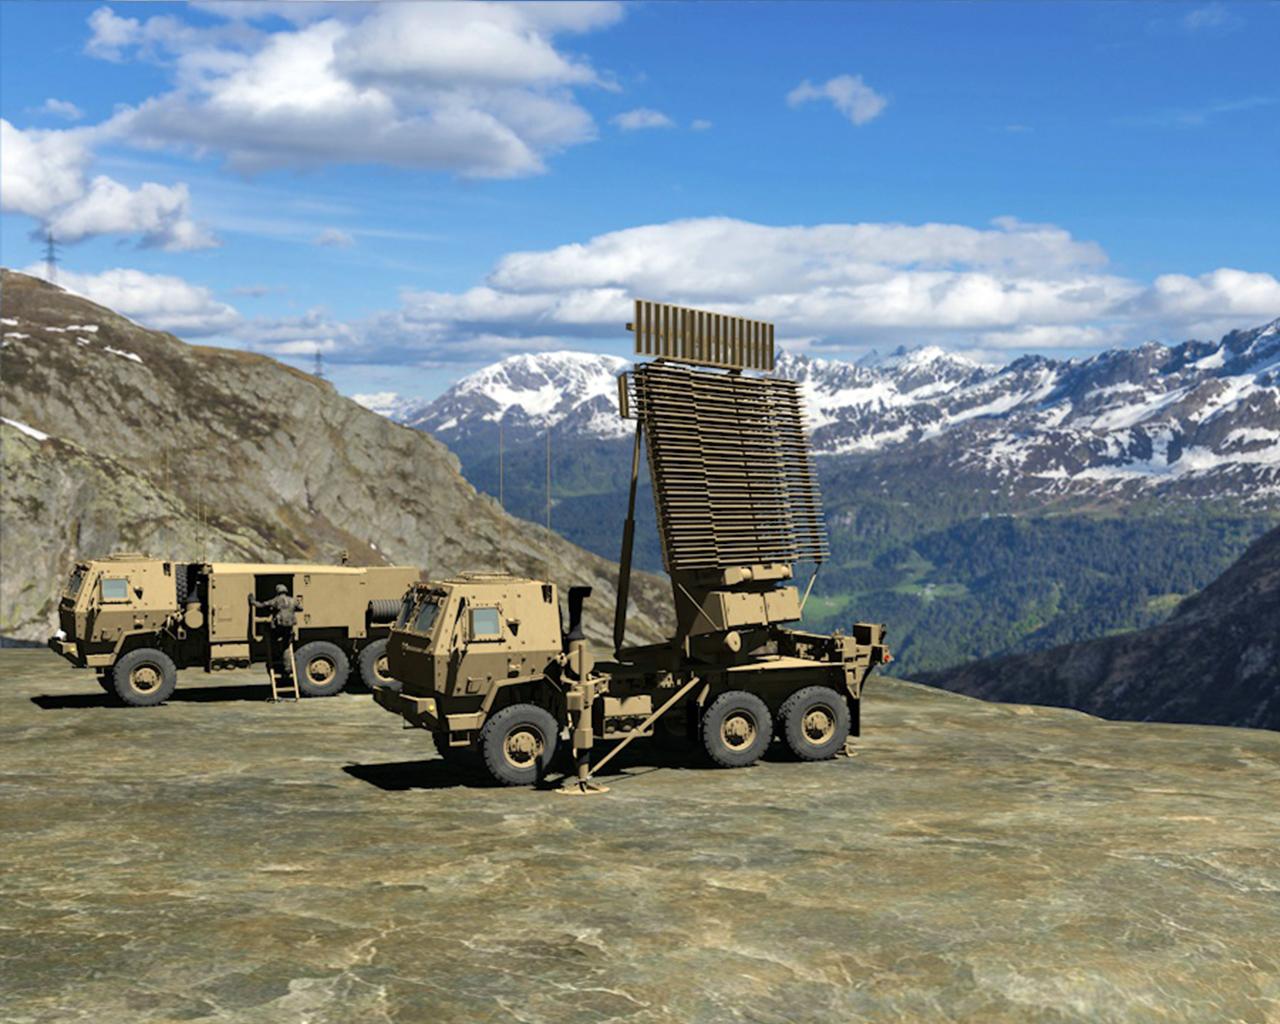 Lockheed Martin's TPS-77 multi-role radar